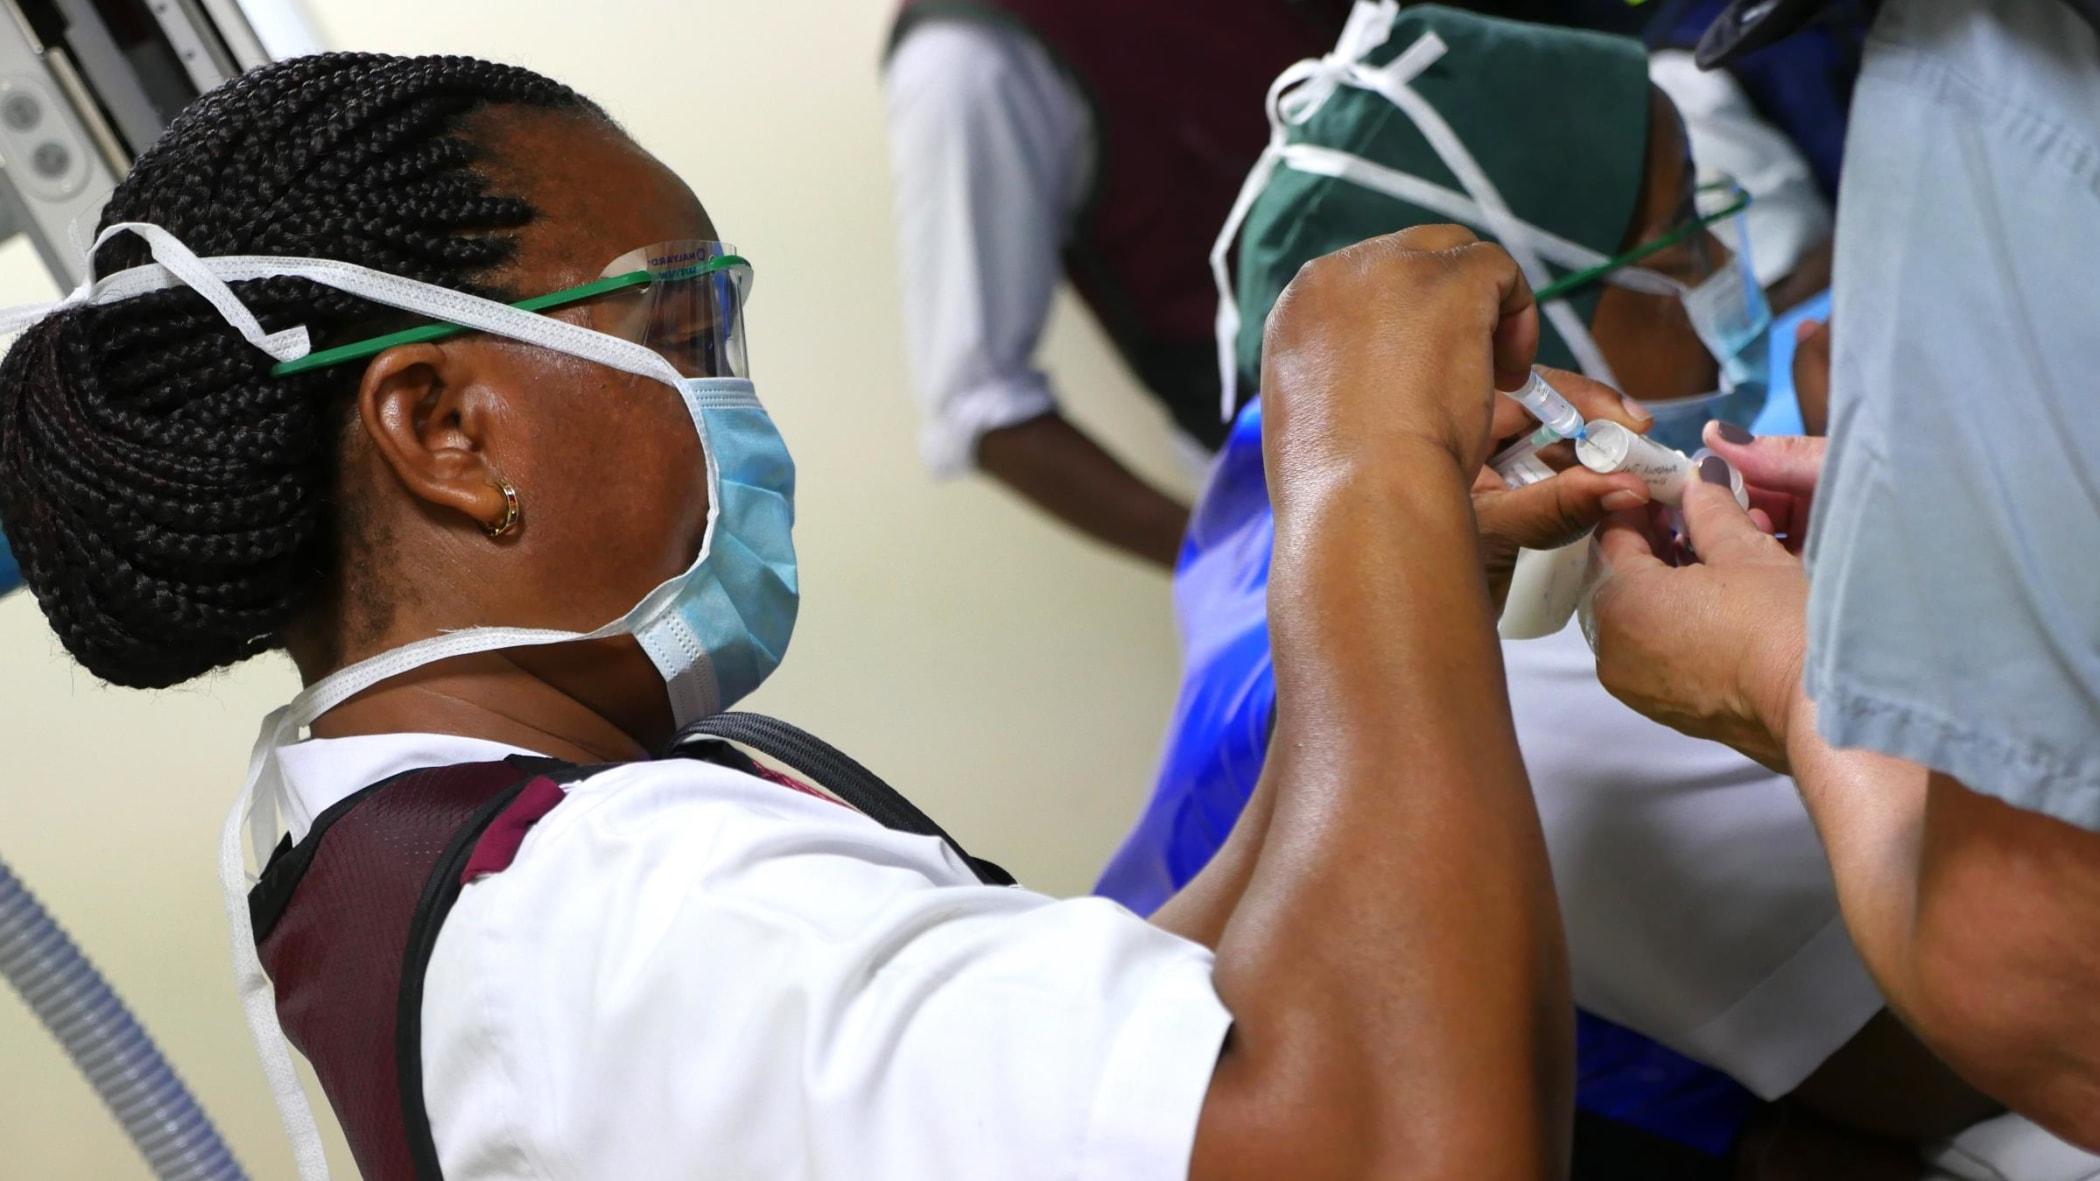 Tanzanian IR nurse Bridgita Fwaja drawing up medications for a procedure.